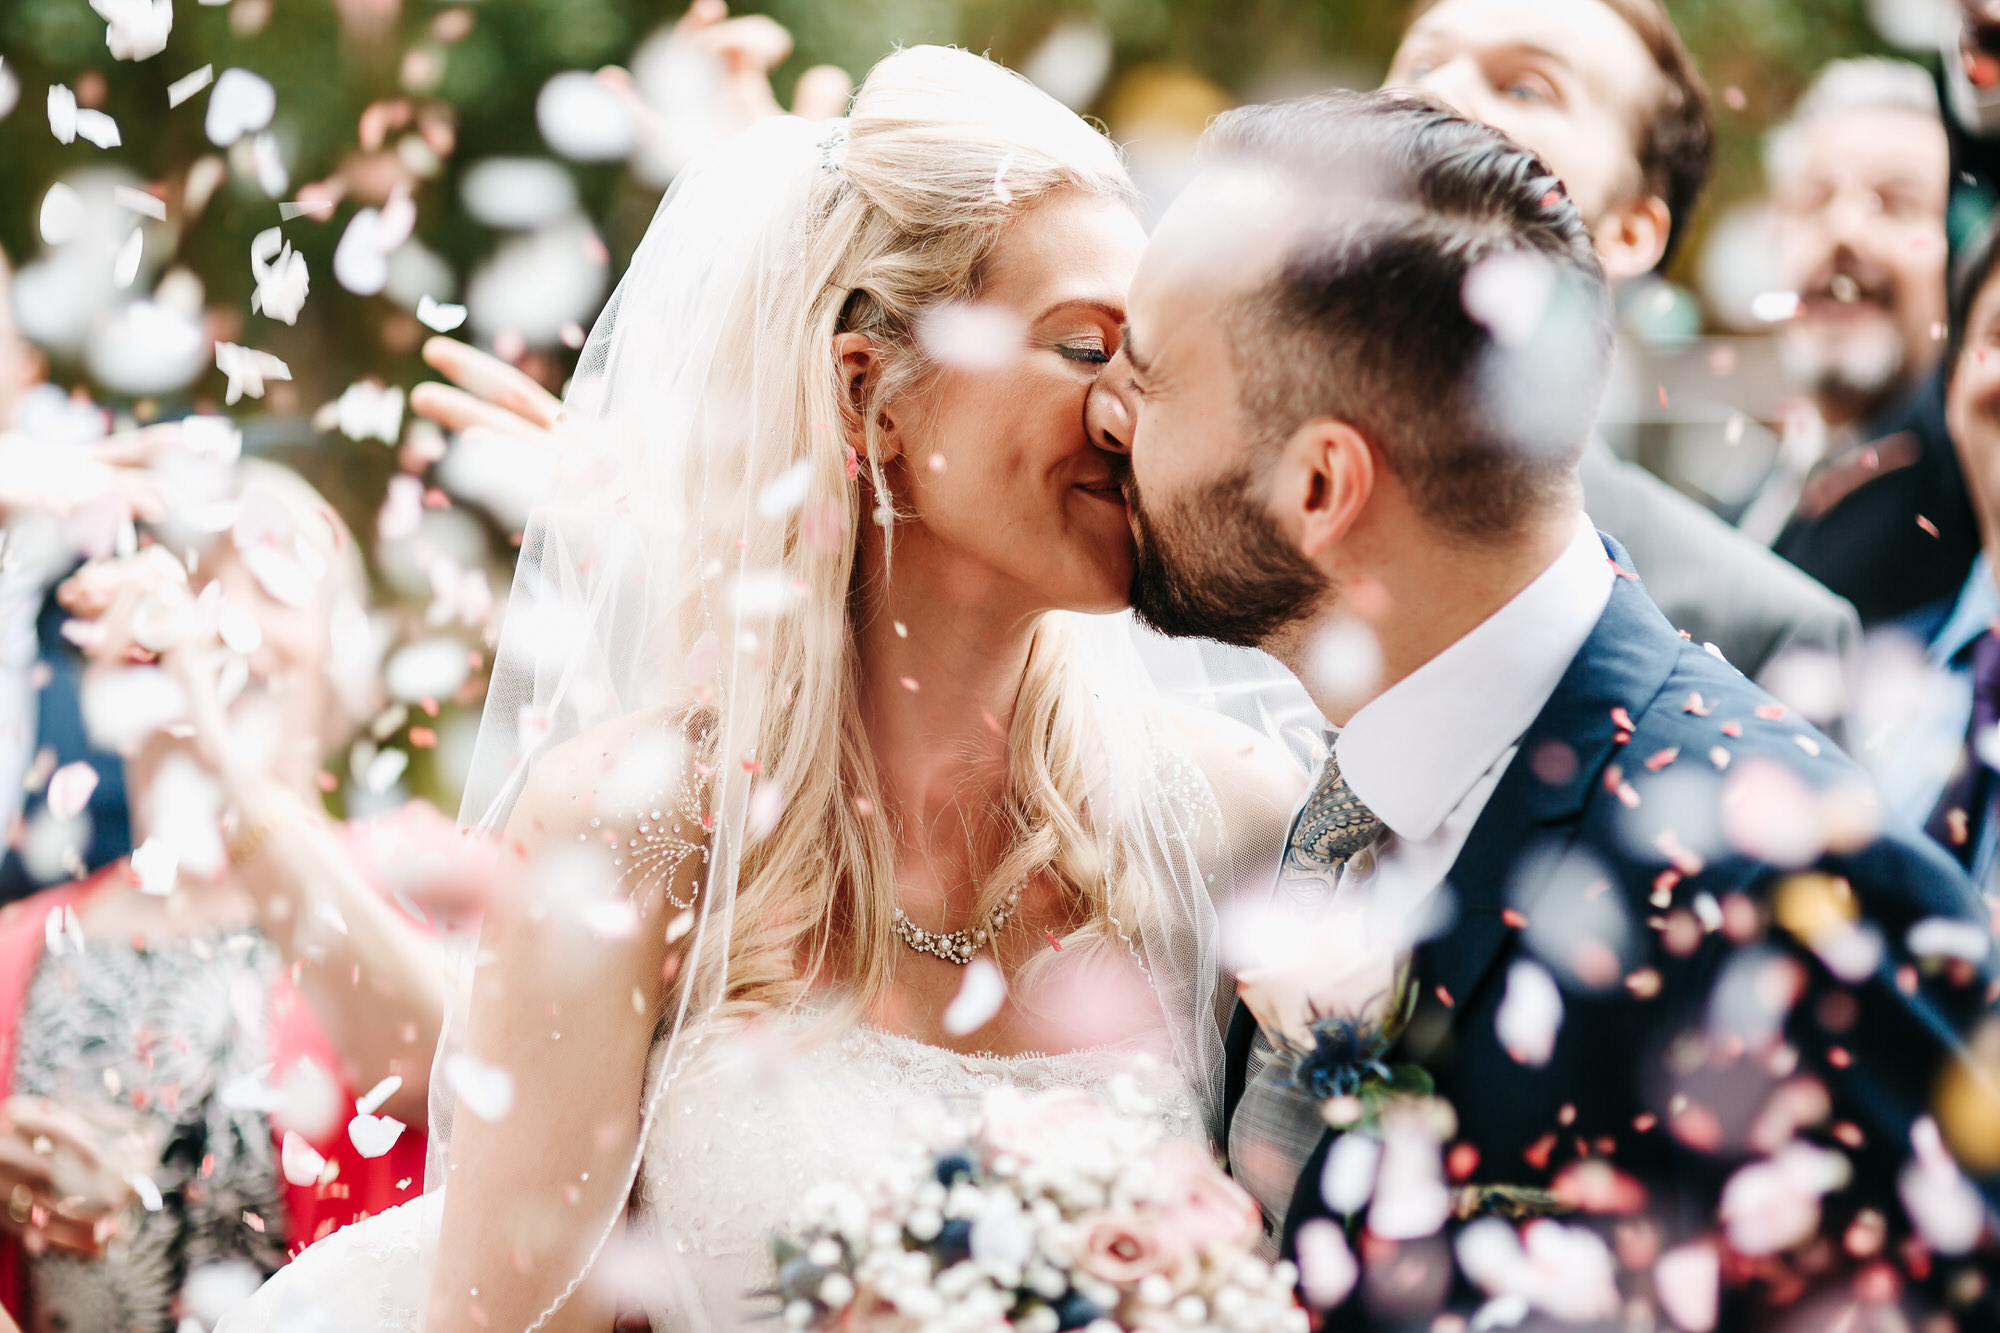 Best Of Yorkshire Wedding Photography 2017 - Martyn Hand-6.jpg